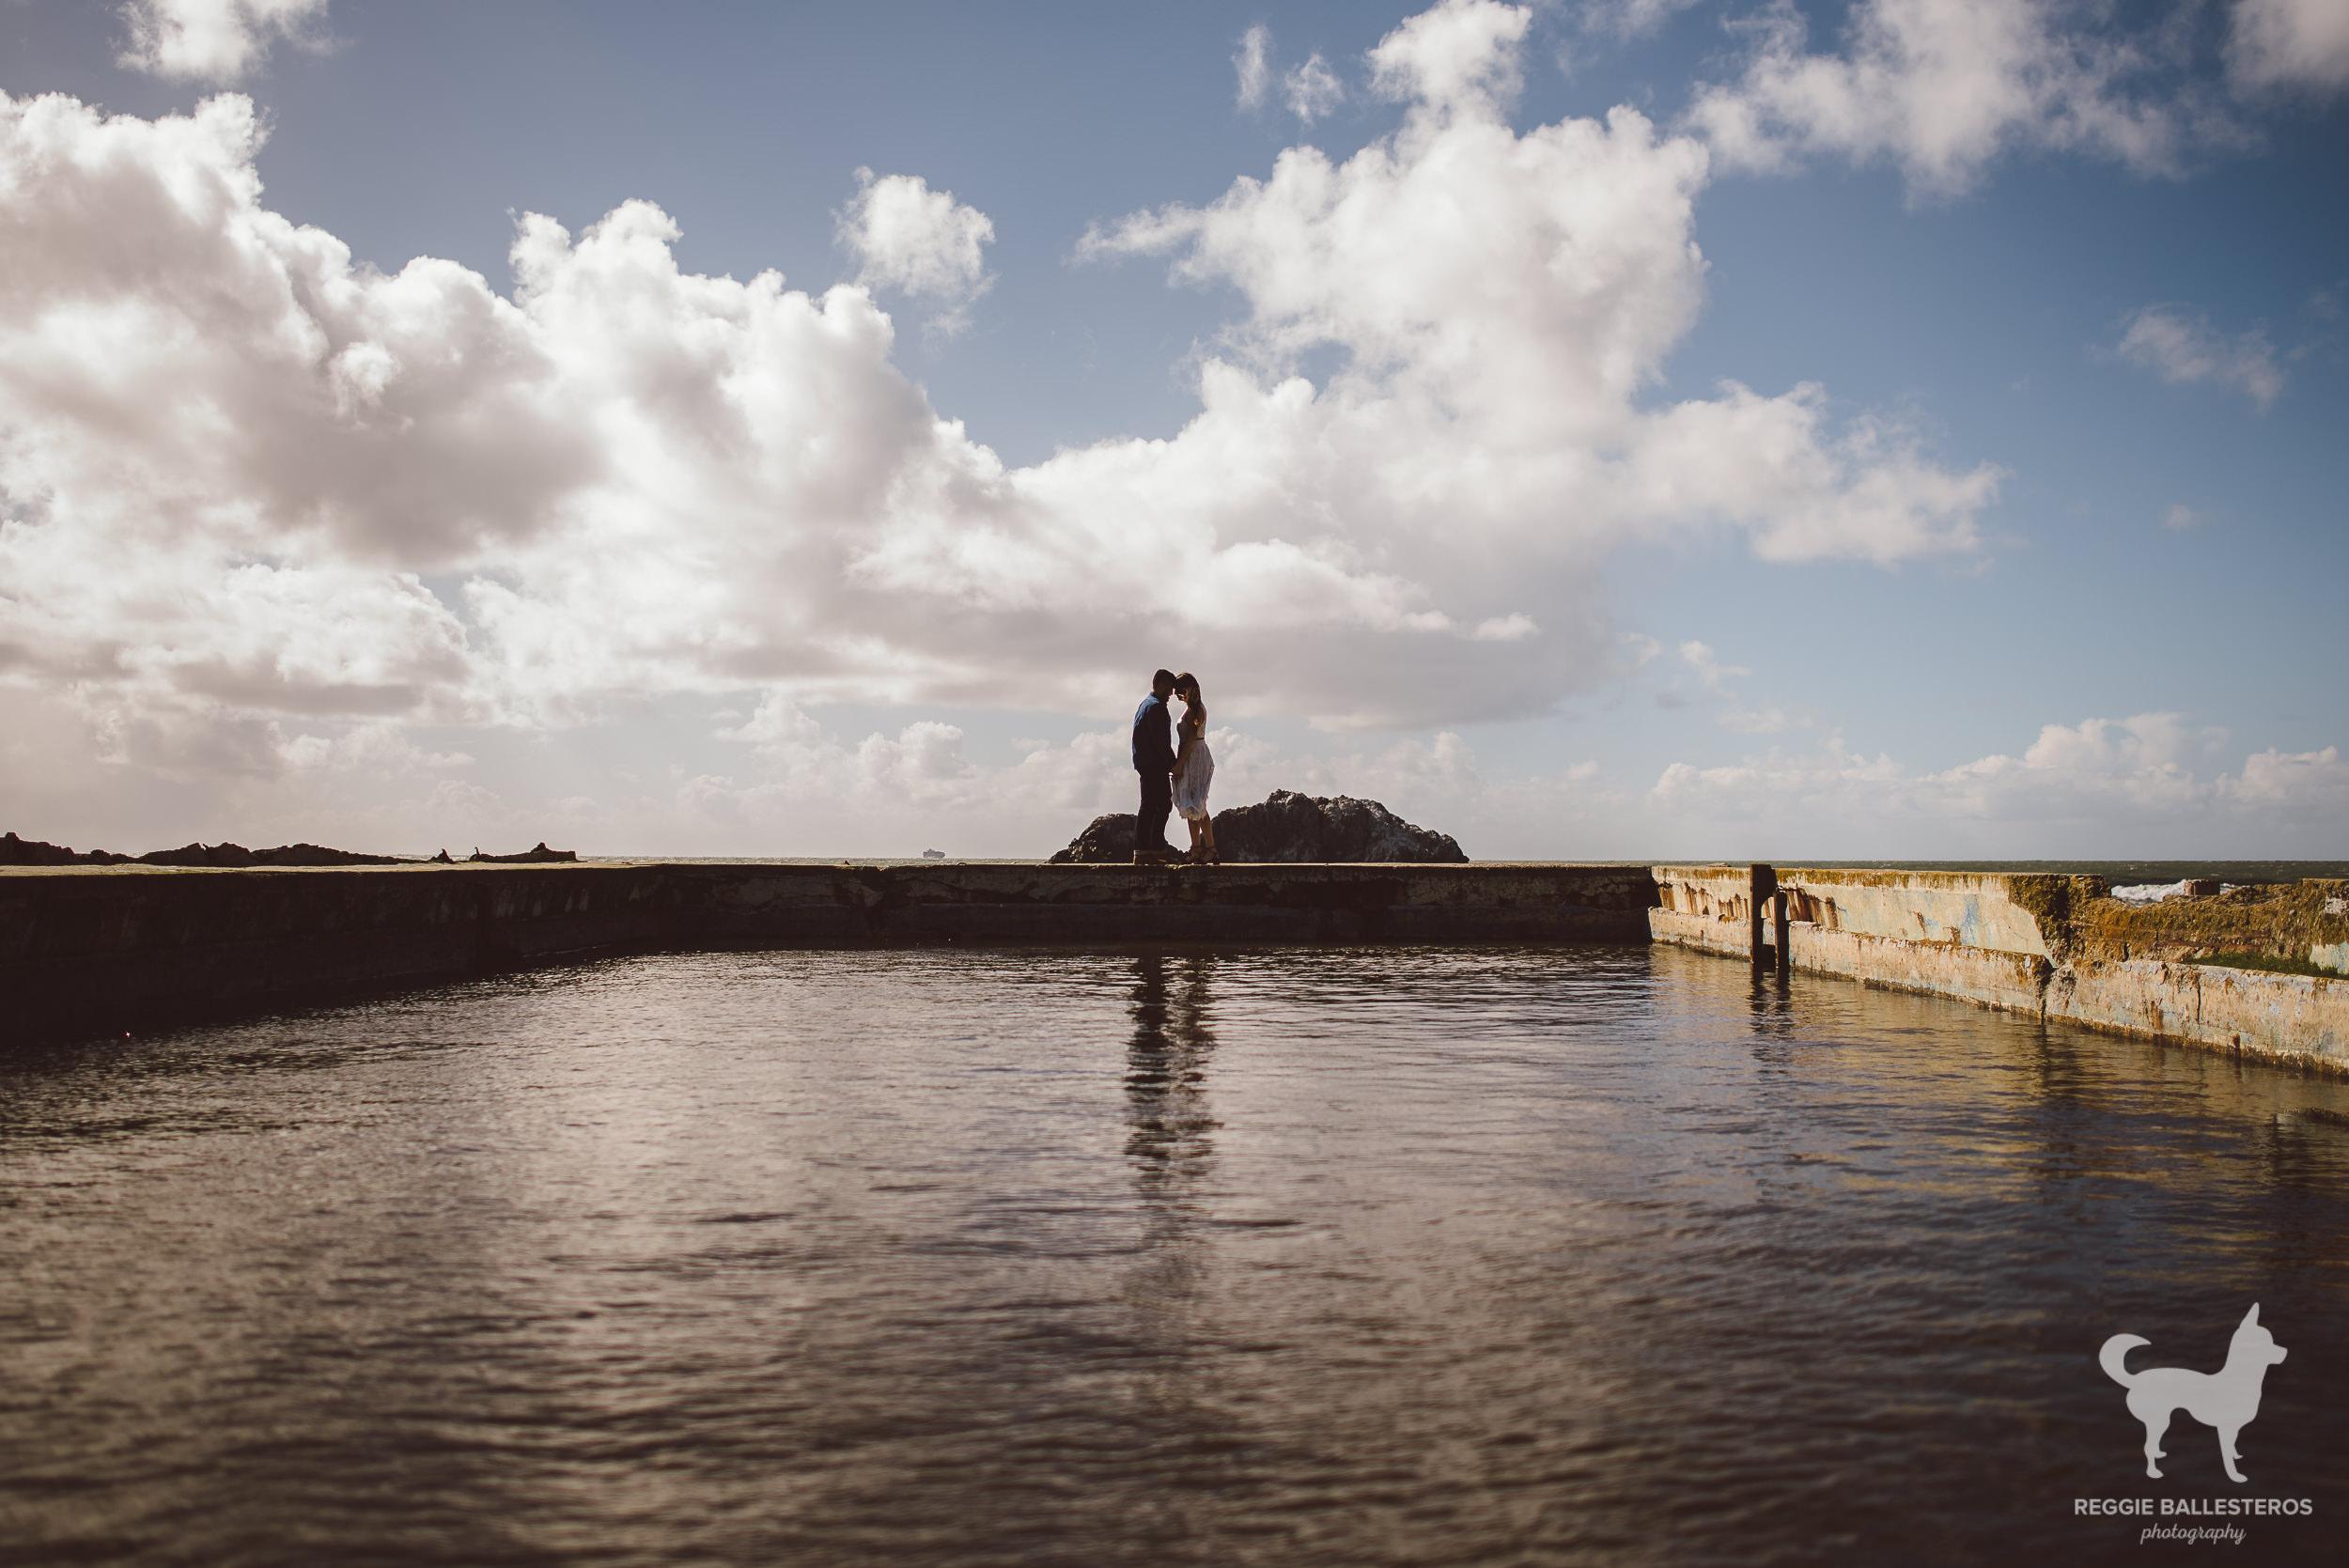 Lands-End-Sutro-Baths-San-Francisco-Engagement-Photography-010.jpg